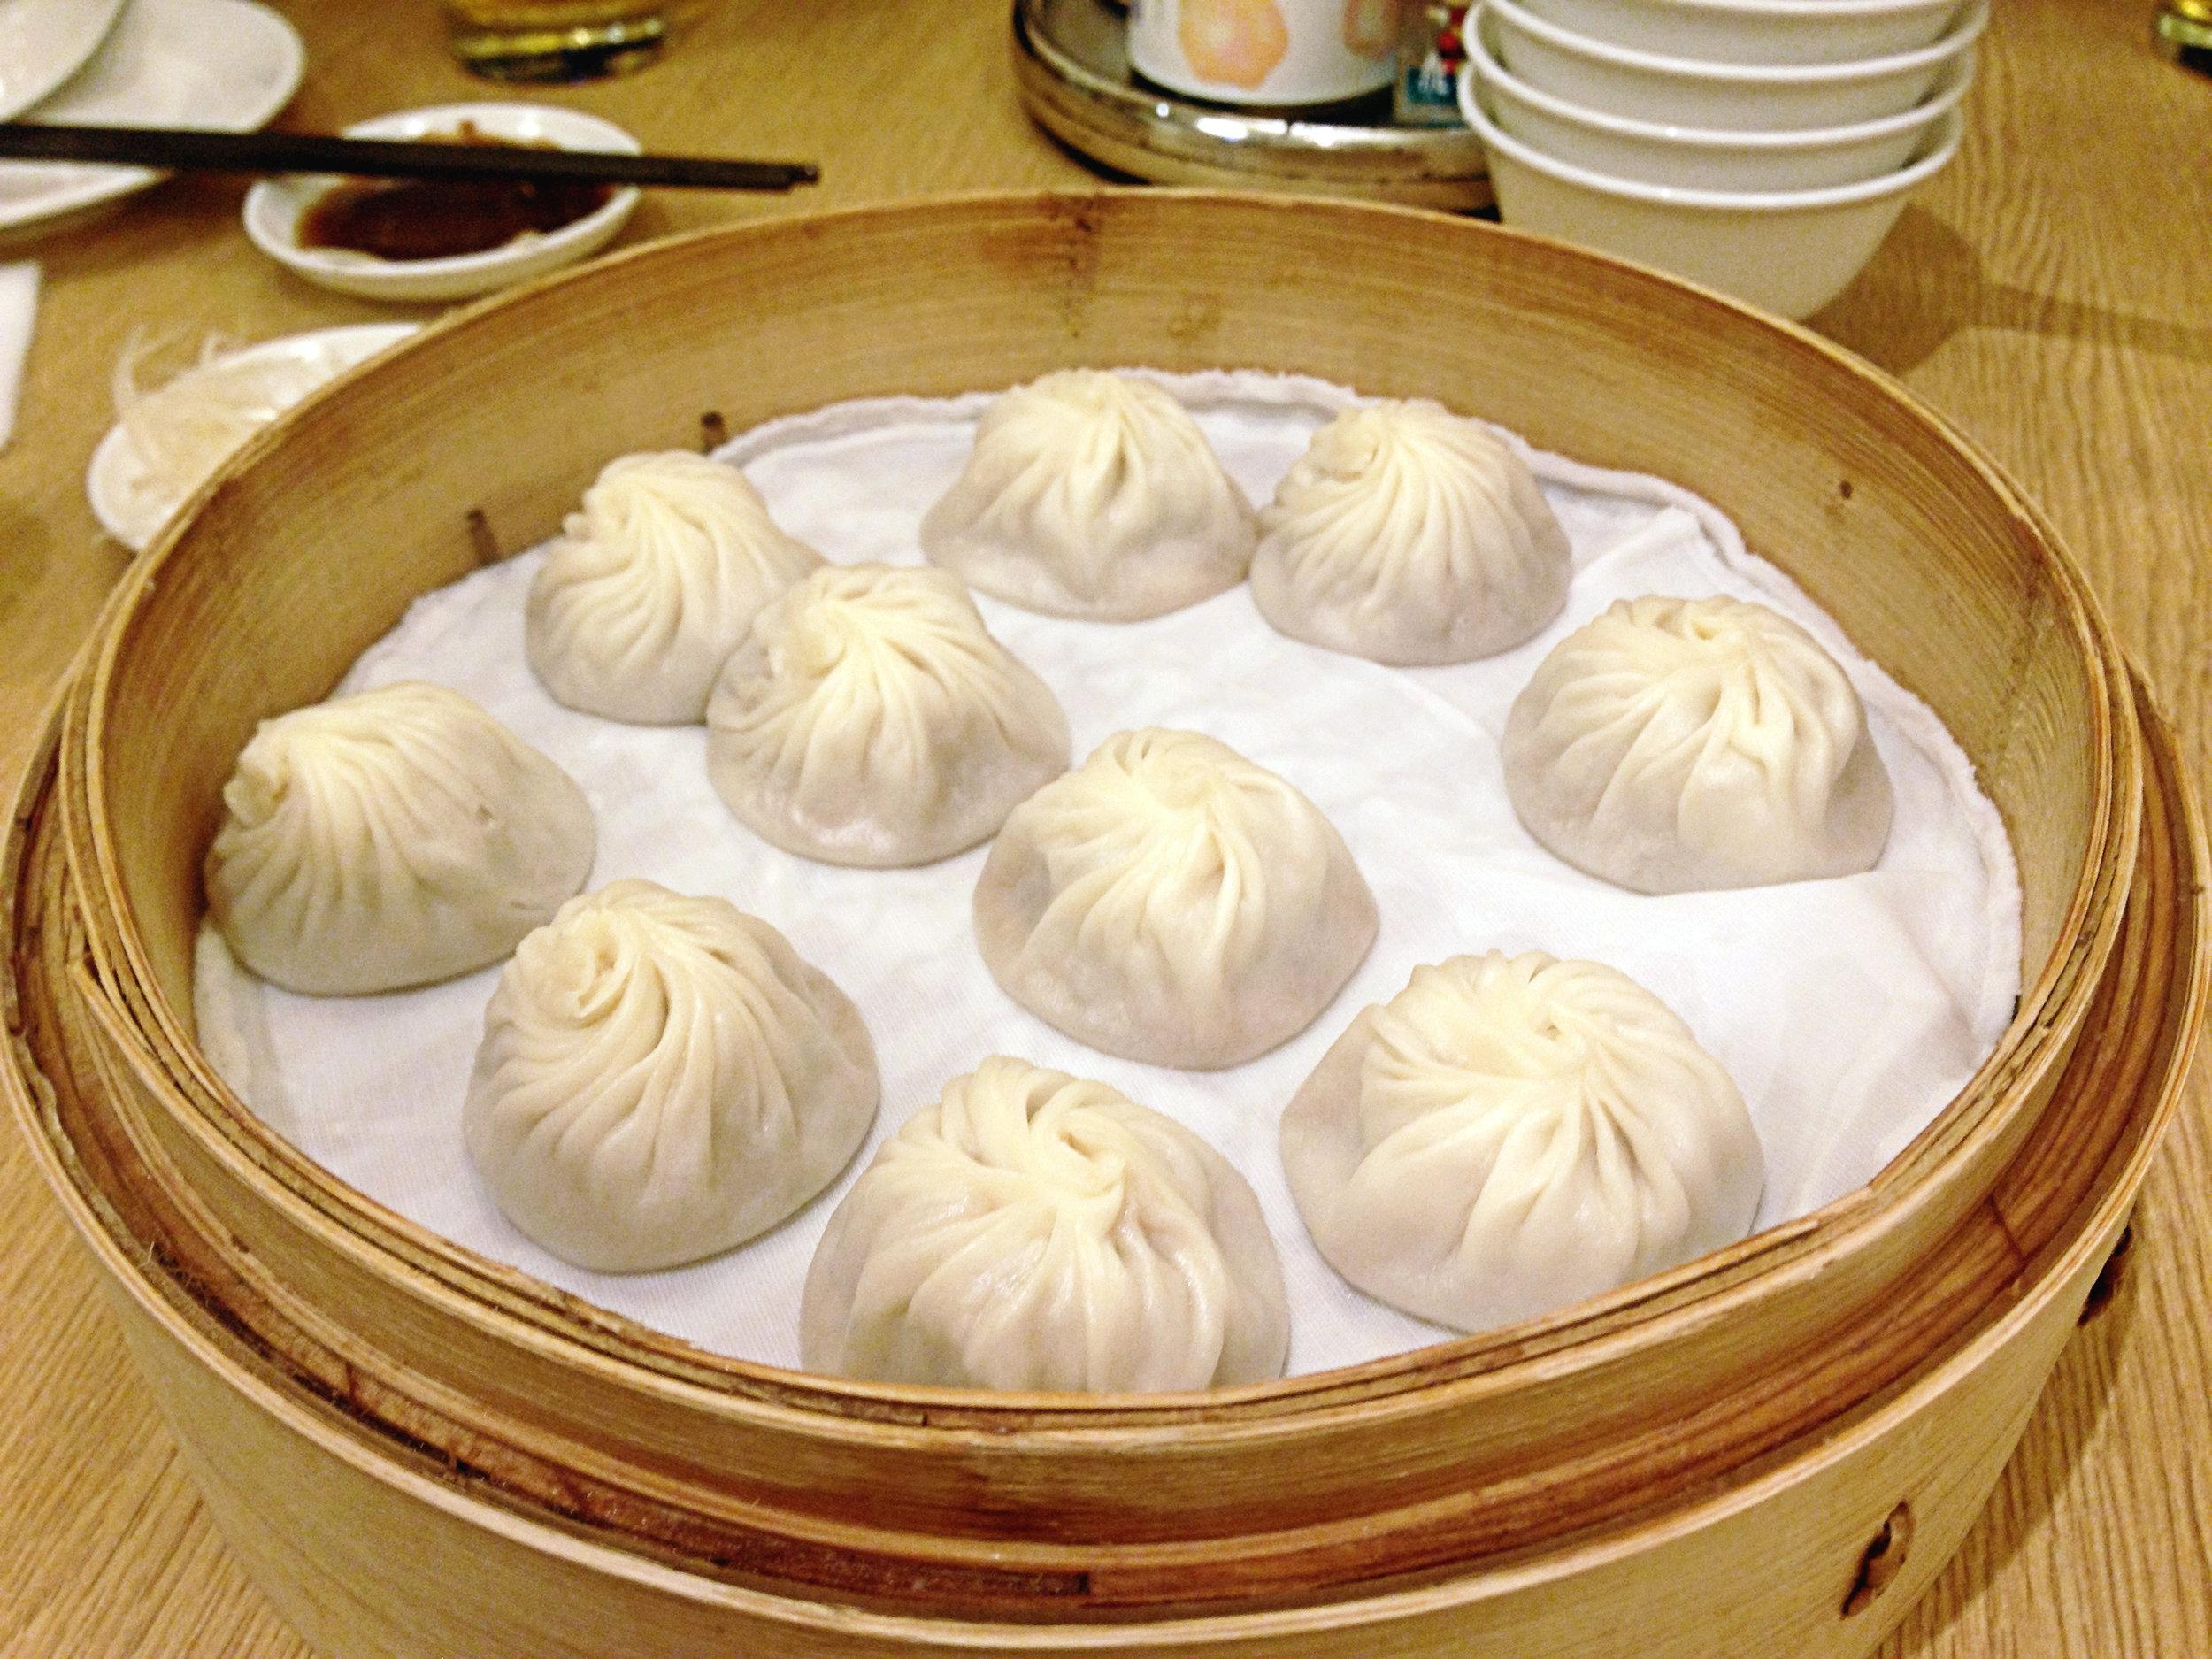 taipei-food-dintaifung-dumplings.jpg